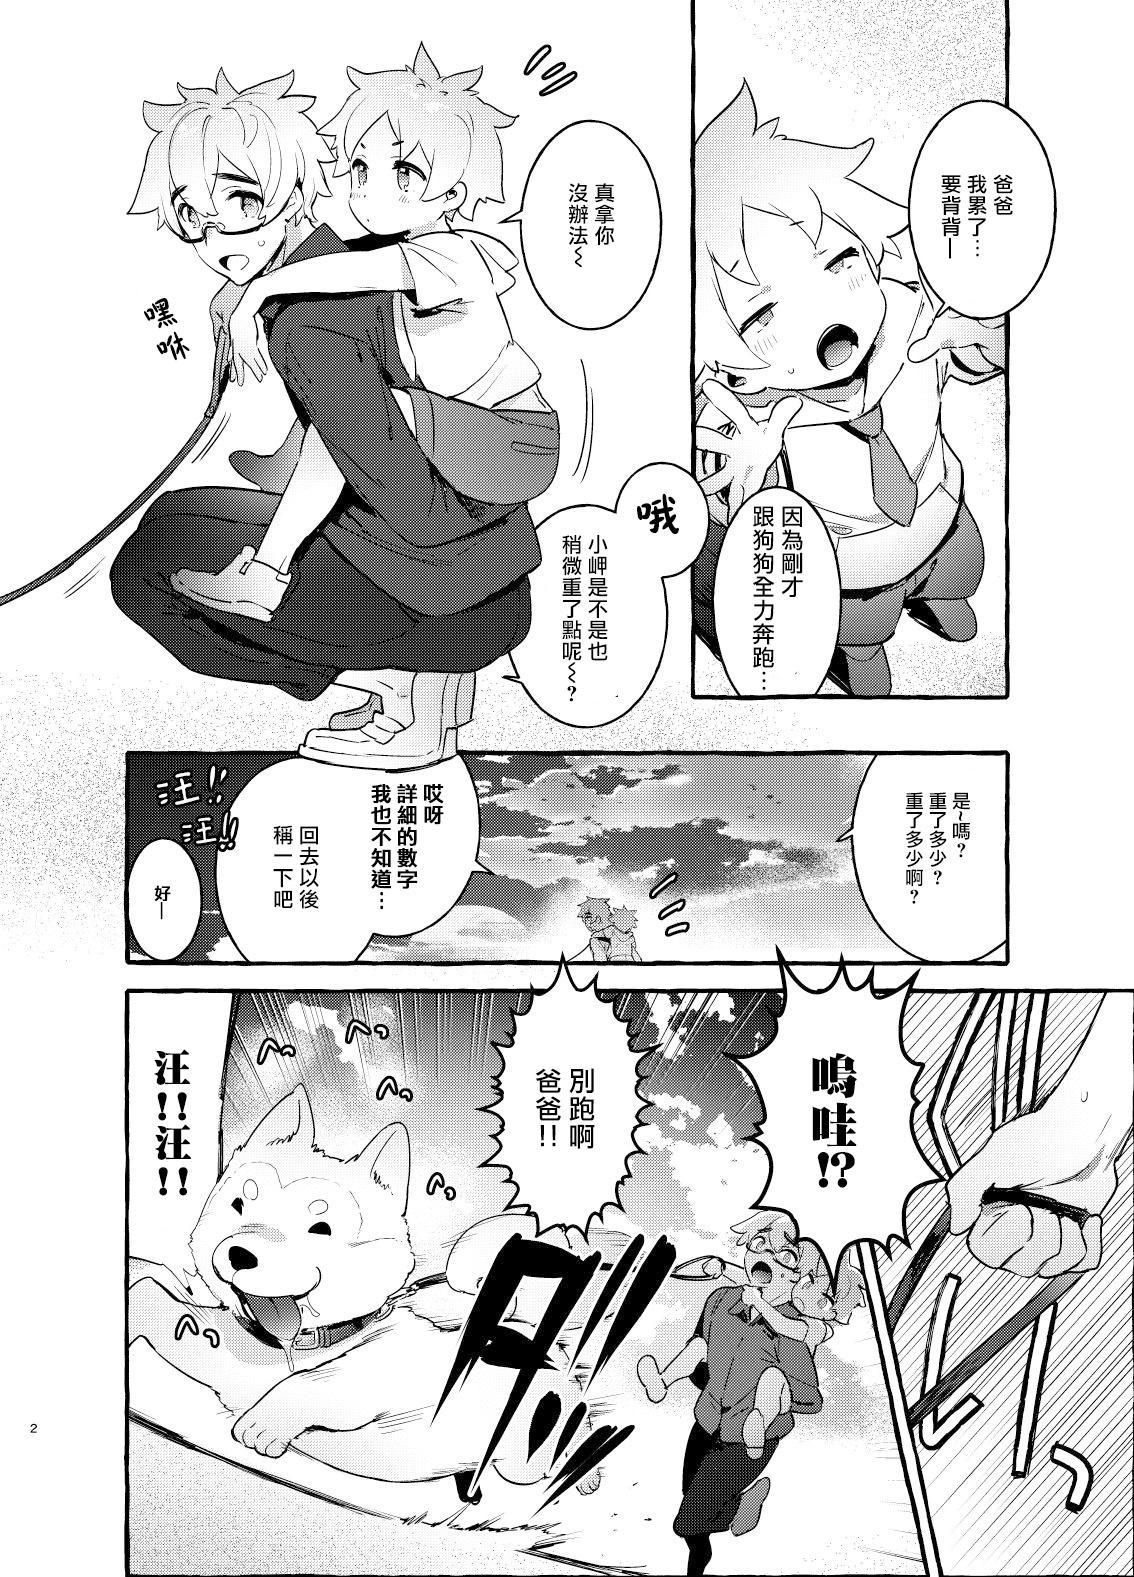 [Otosan no Kurorekishi (Maemukina Do M)]  Wanwan Otou-san   犬系爸爸 01-02 [Chinese] [拾荒者汉化组] [Digital] 2